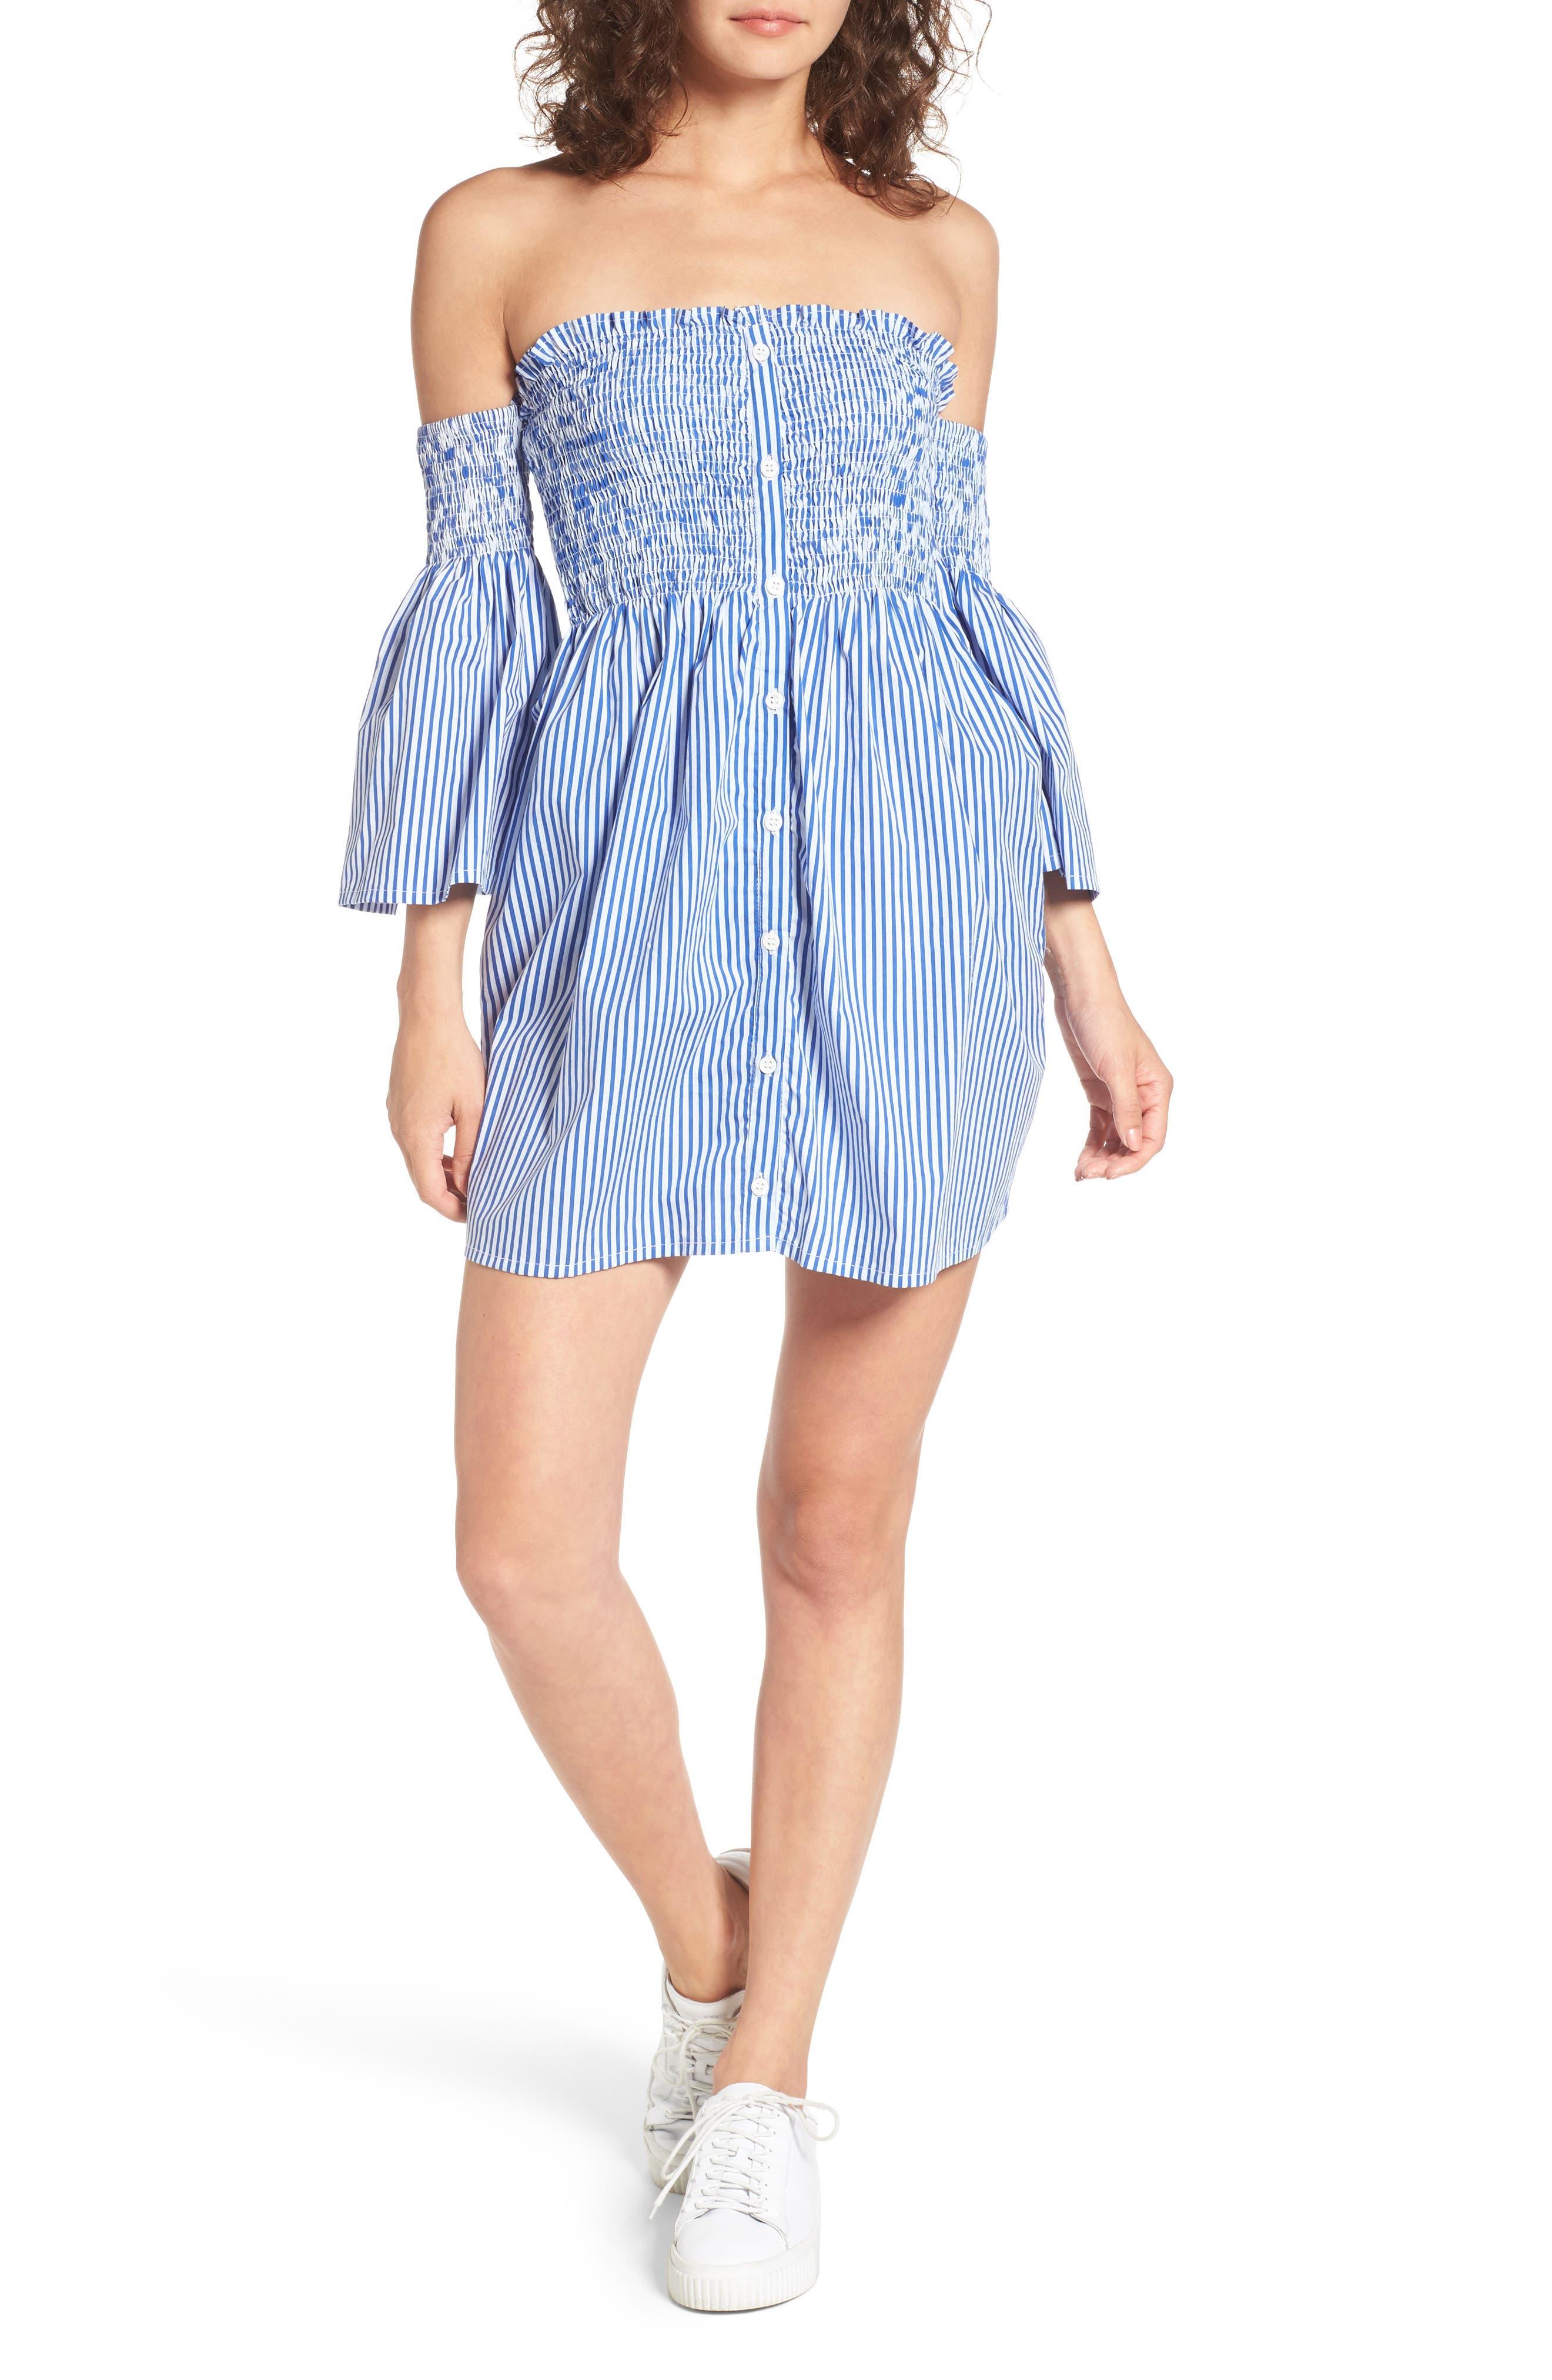 FAITHFULL THE BRAND Hockney Off the Shoulder Dress